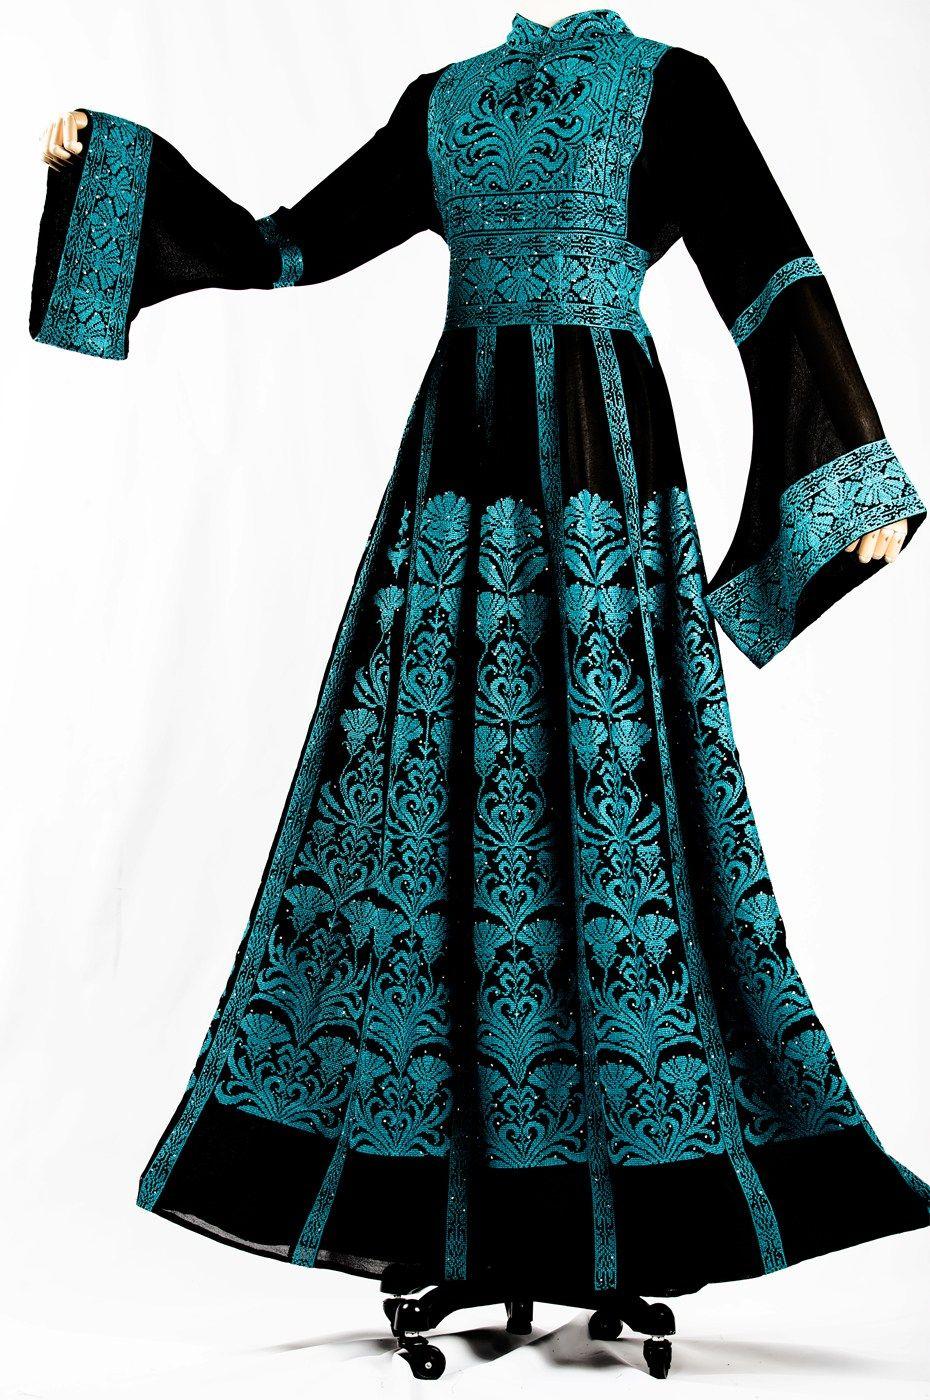 جلابية شرحات دبل كلوش السندس Formal Dresses Long Sleeve Dress Formal Dresses Long